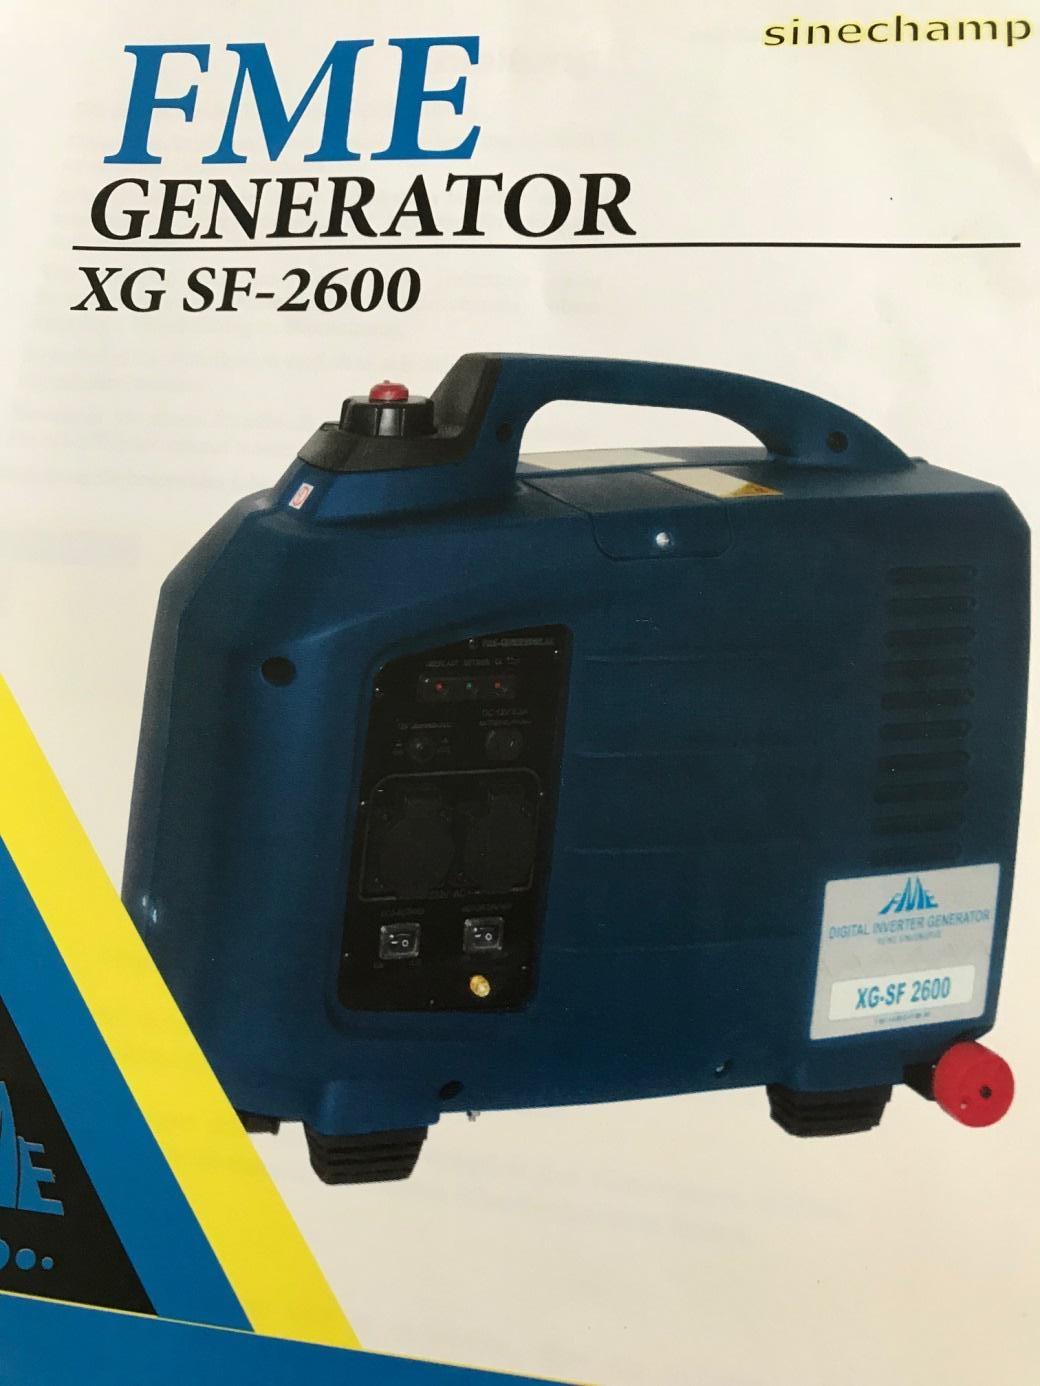 Generatorjpg